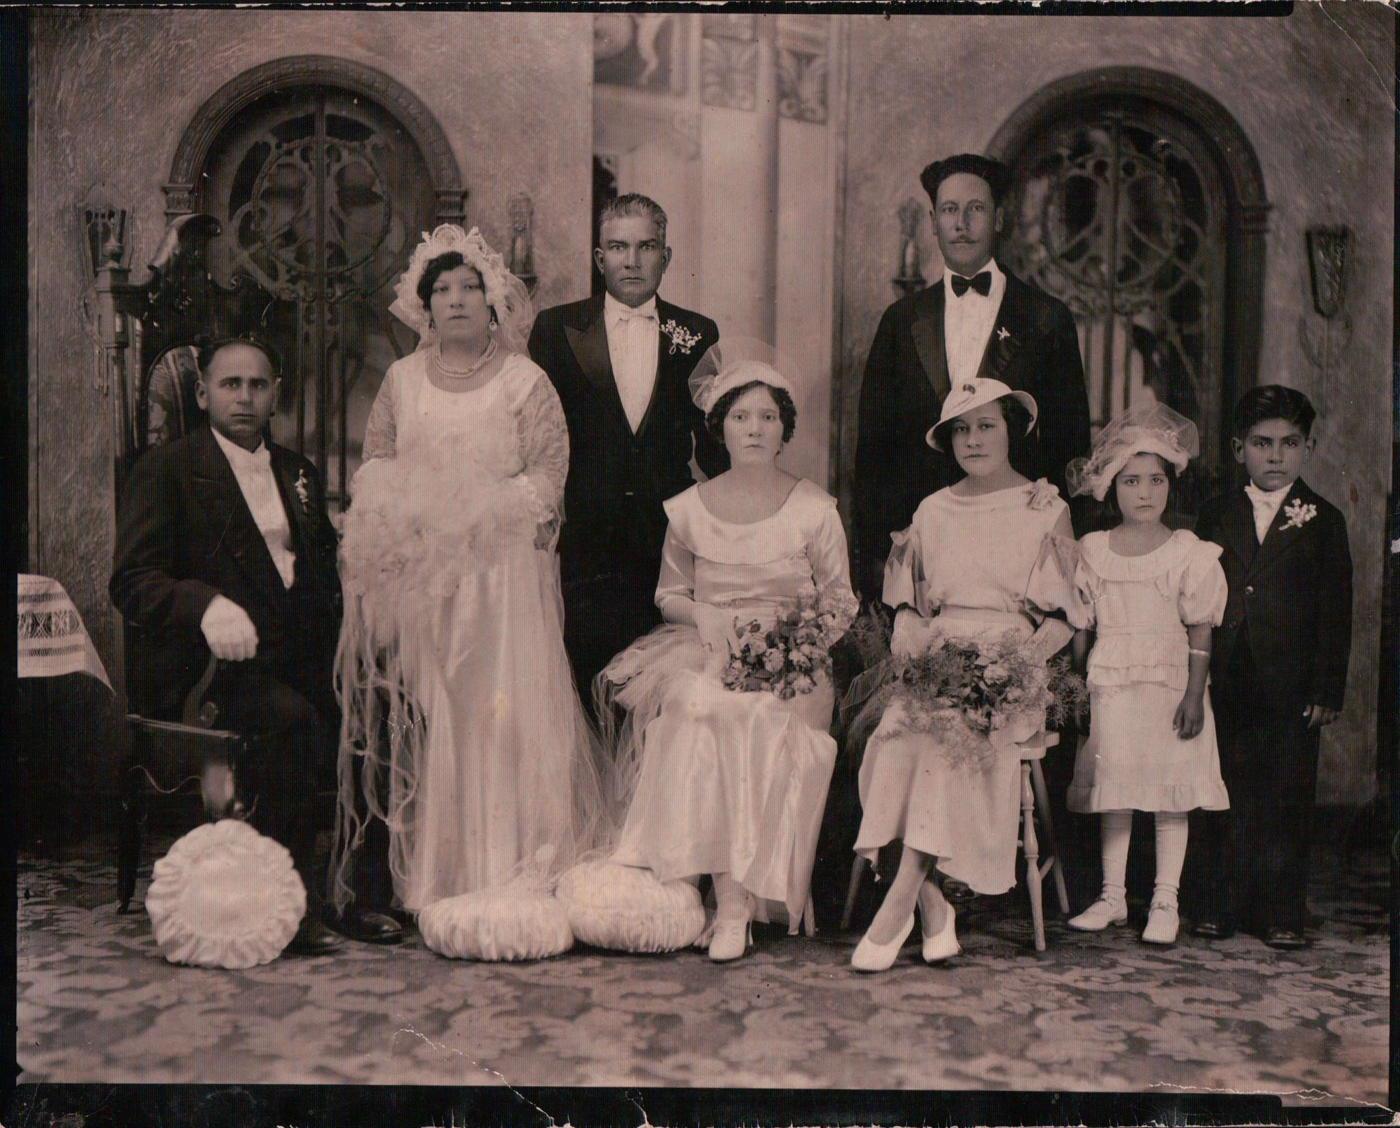 Mexican Wedding | Punjabi Mexican Wedding South Asian American Digital Archive Saada